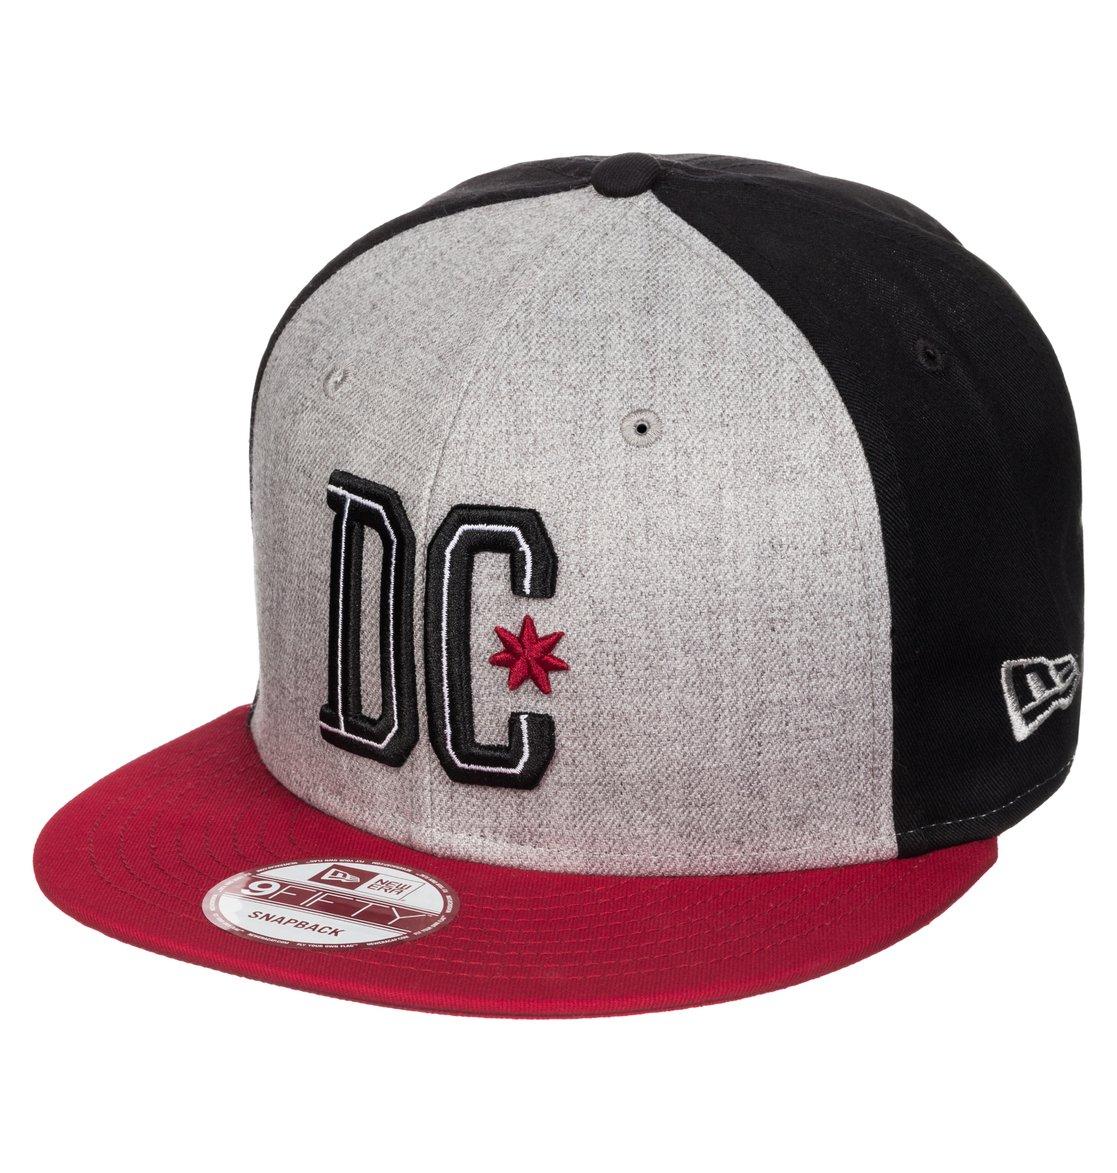 0 Men s RD Downdown Snapback New Era Hat ADYHA03220 DC Shoes 7daa1554a06